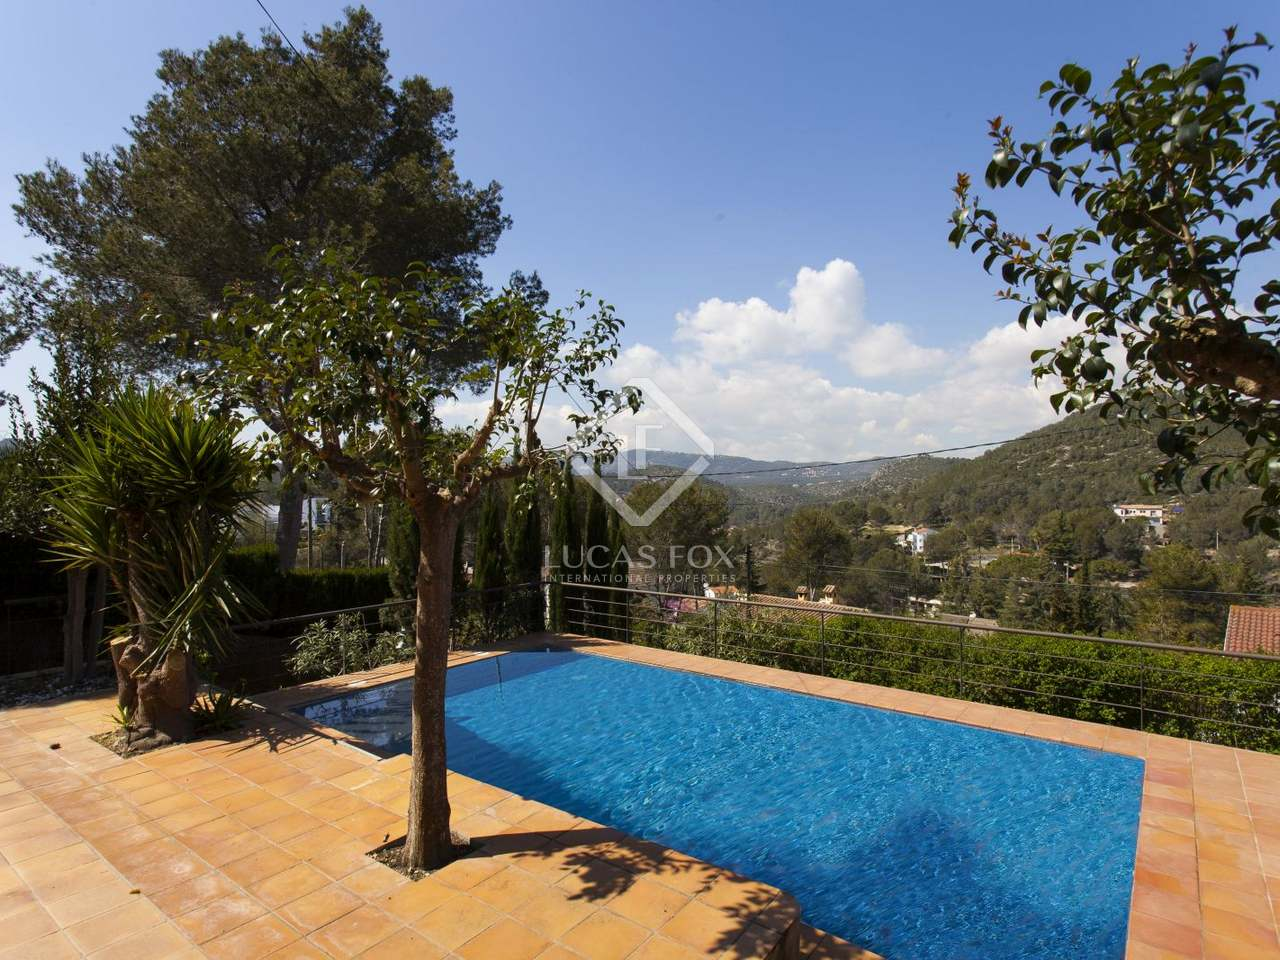 Casa familiar con piscina en venta en sitges barcelona for Piscina sitges